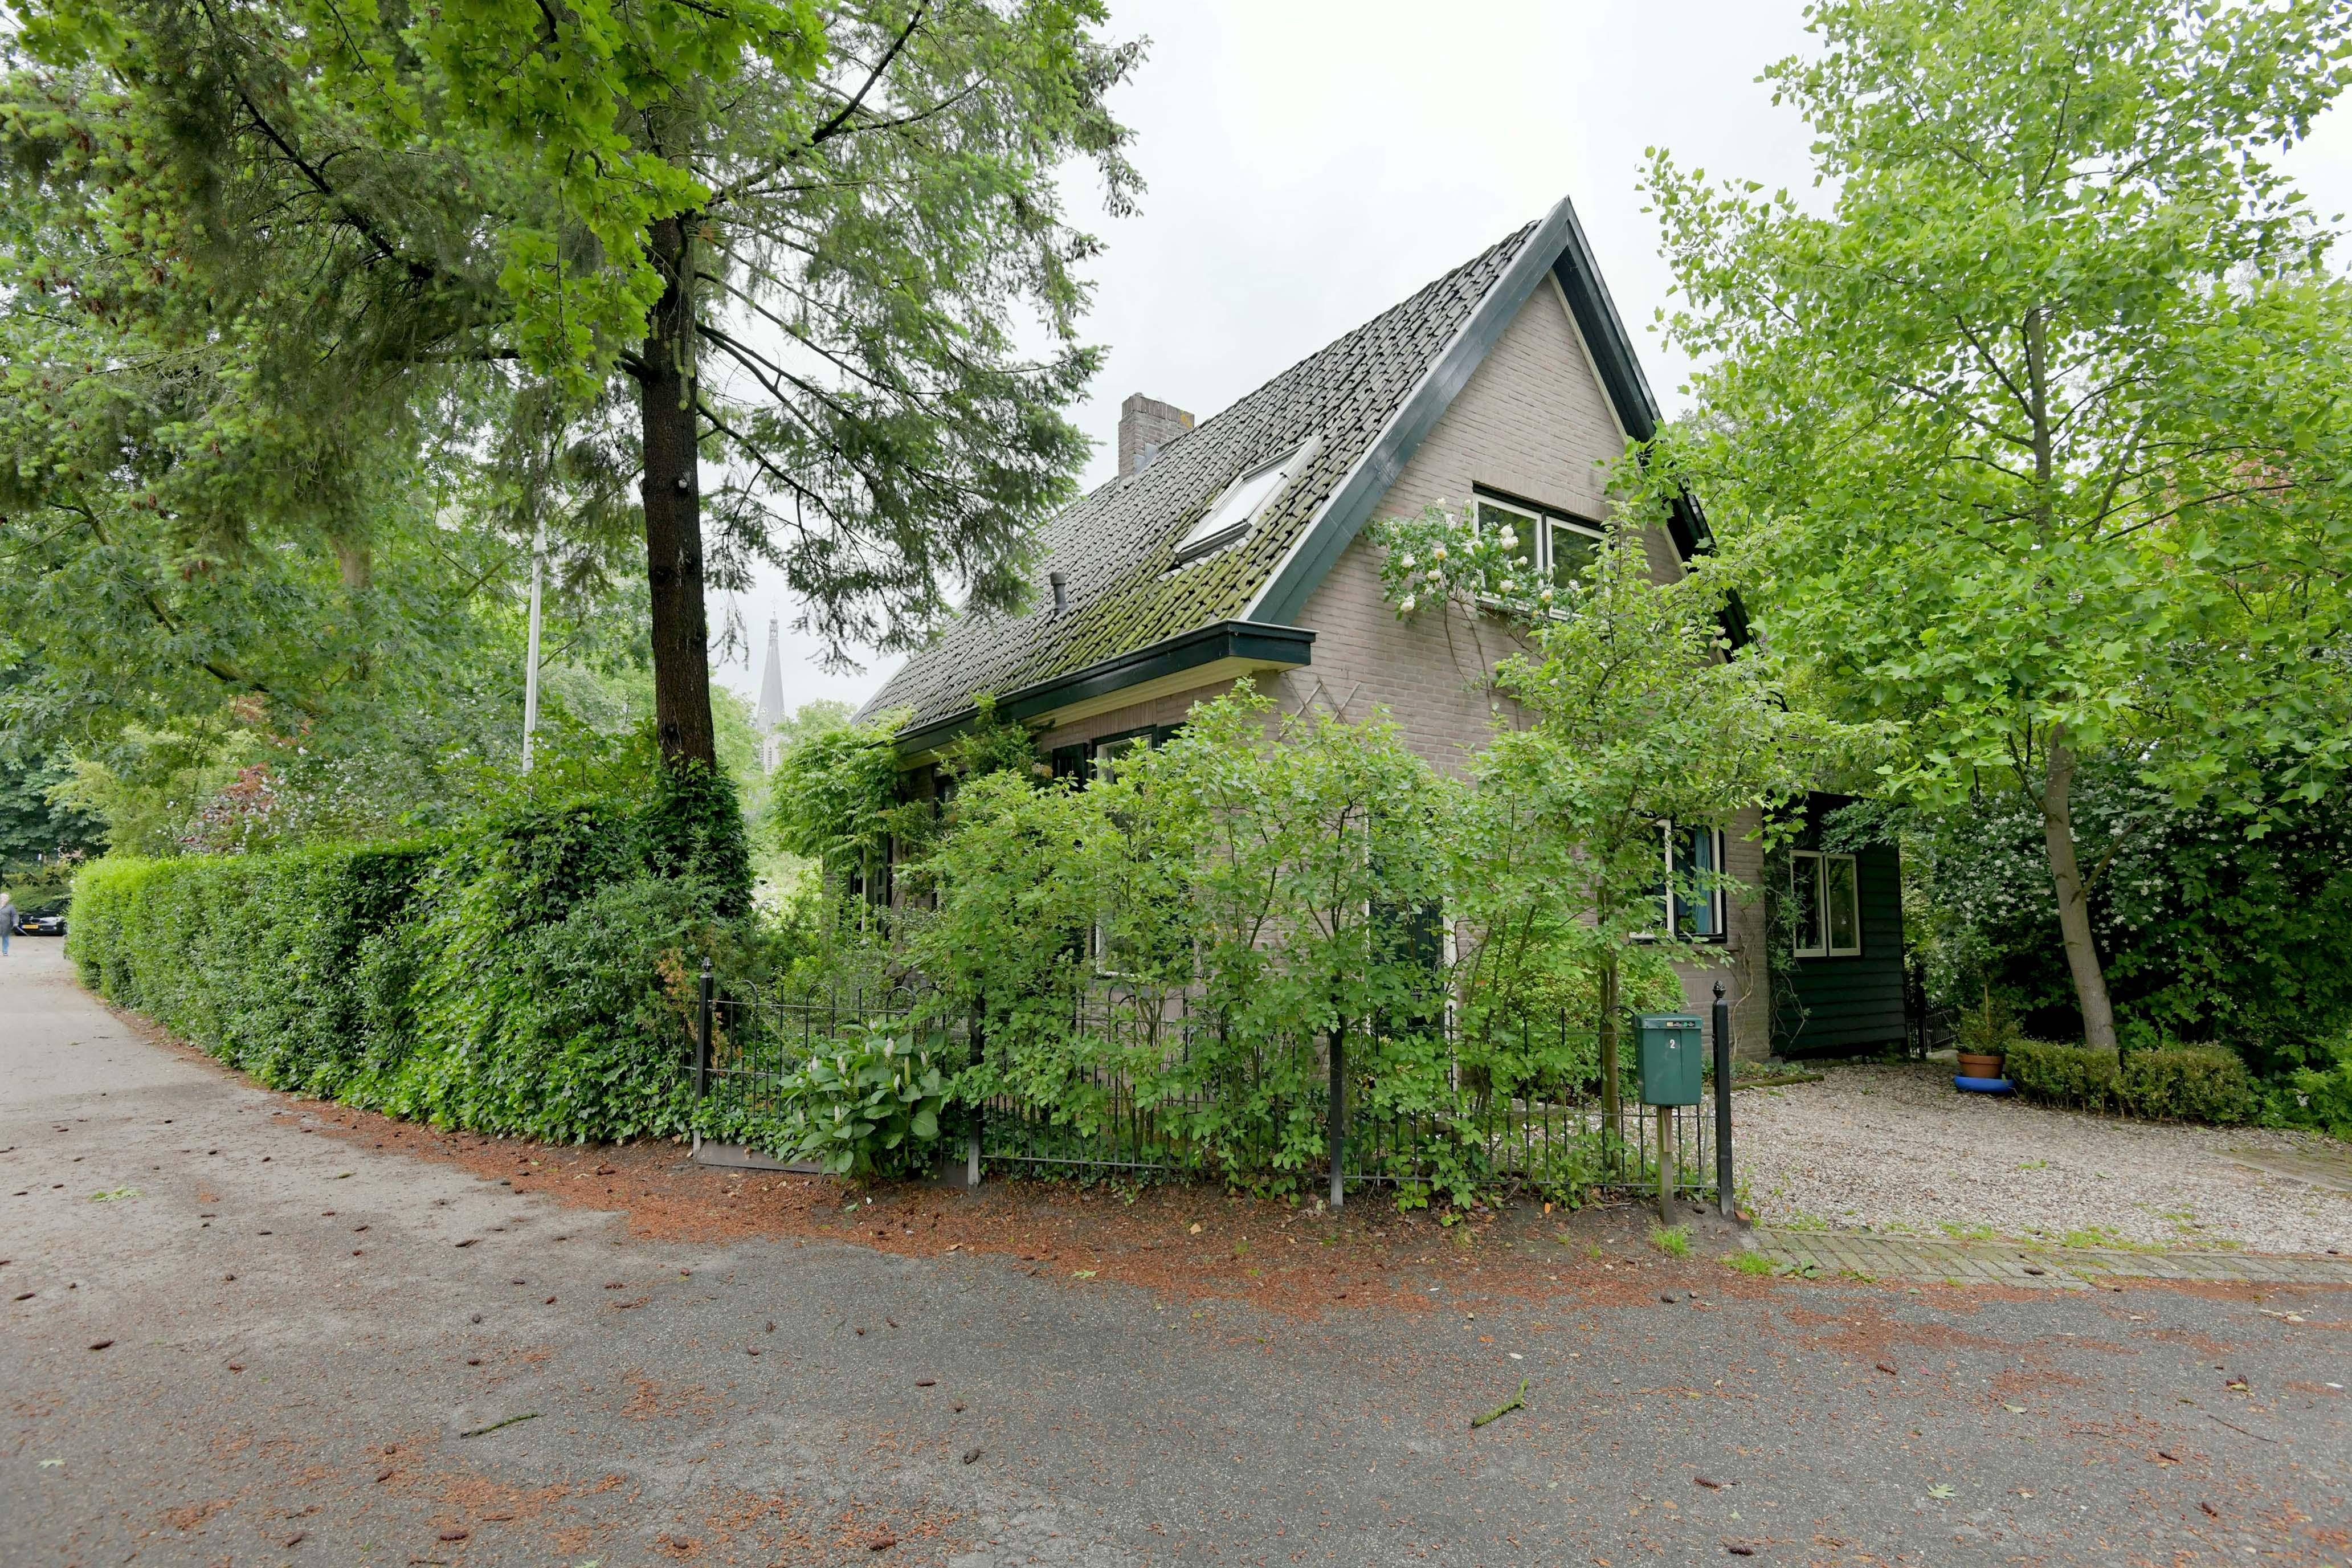 002 ©foto Thoma&Bennink | Burg. Nahuyssingel 2 Doesburg